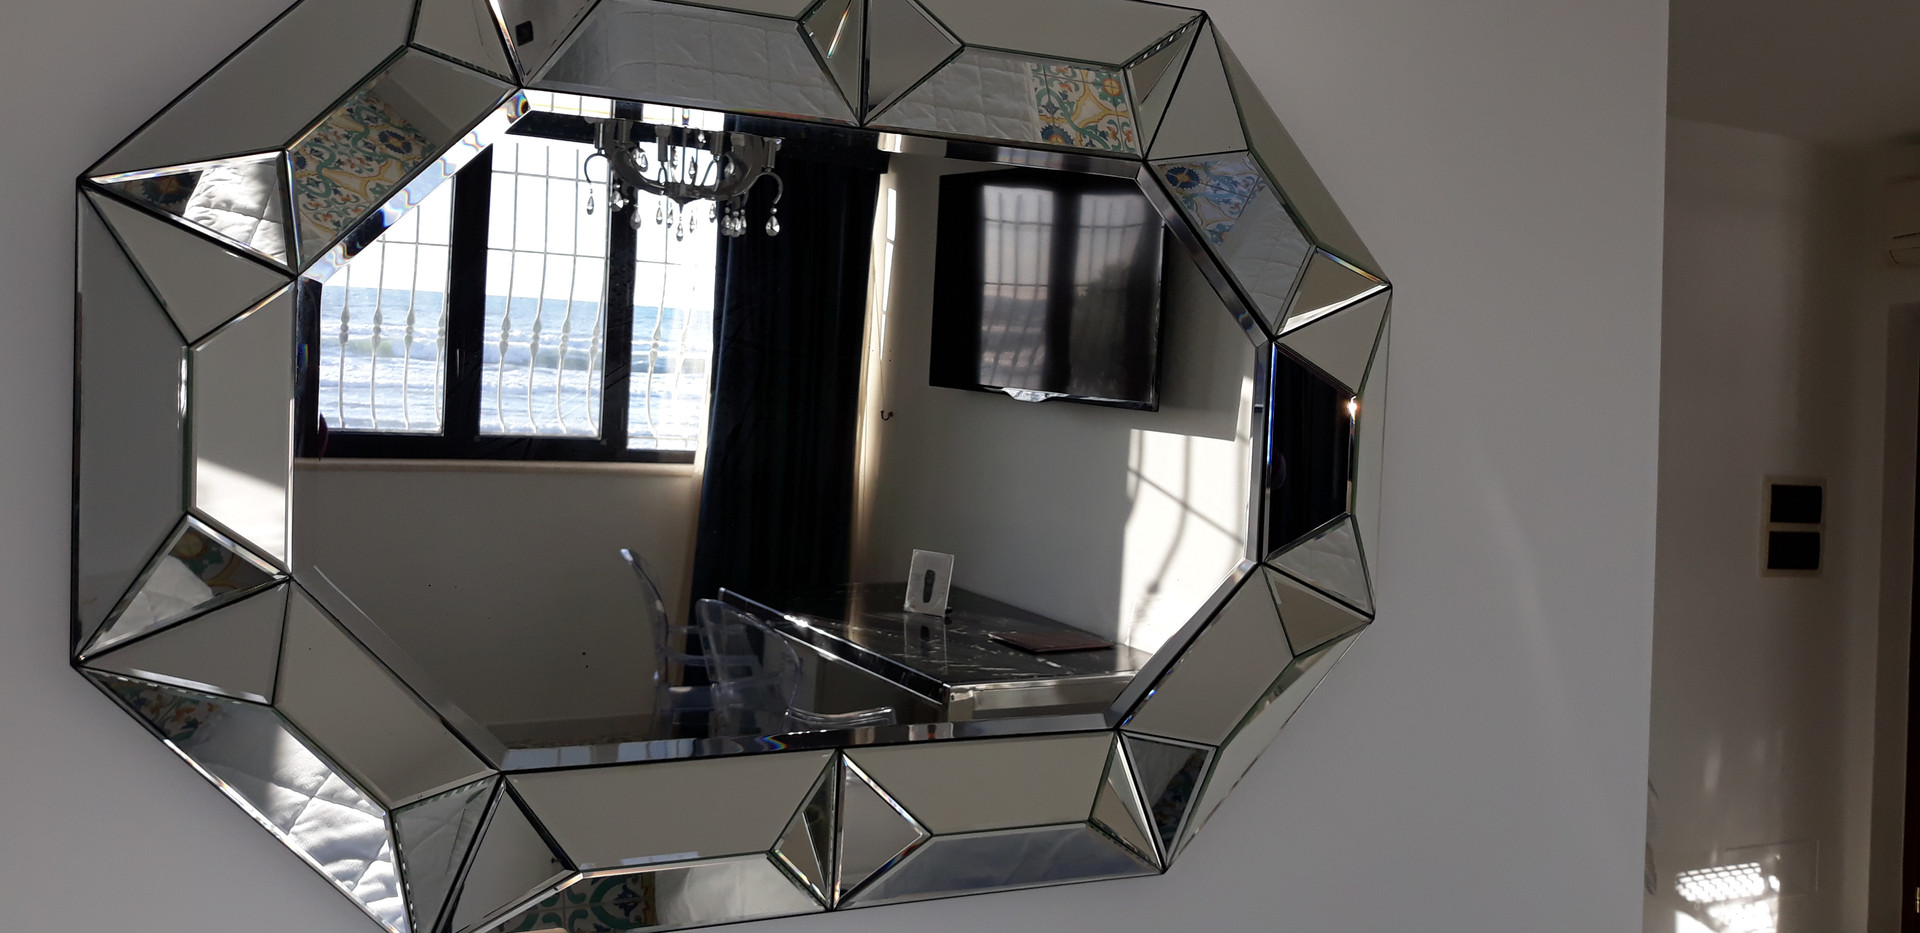 dettaglio specchio